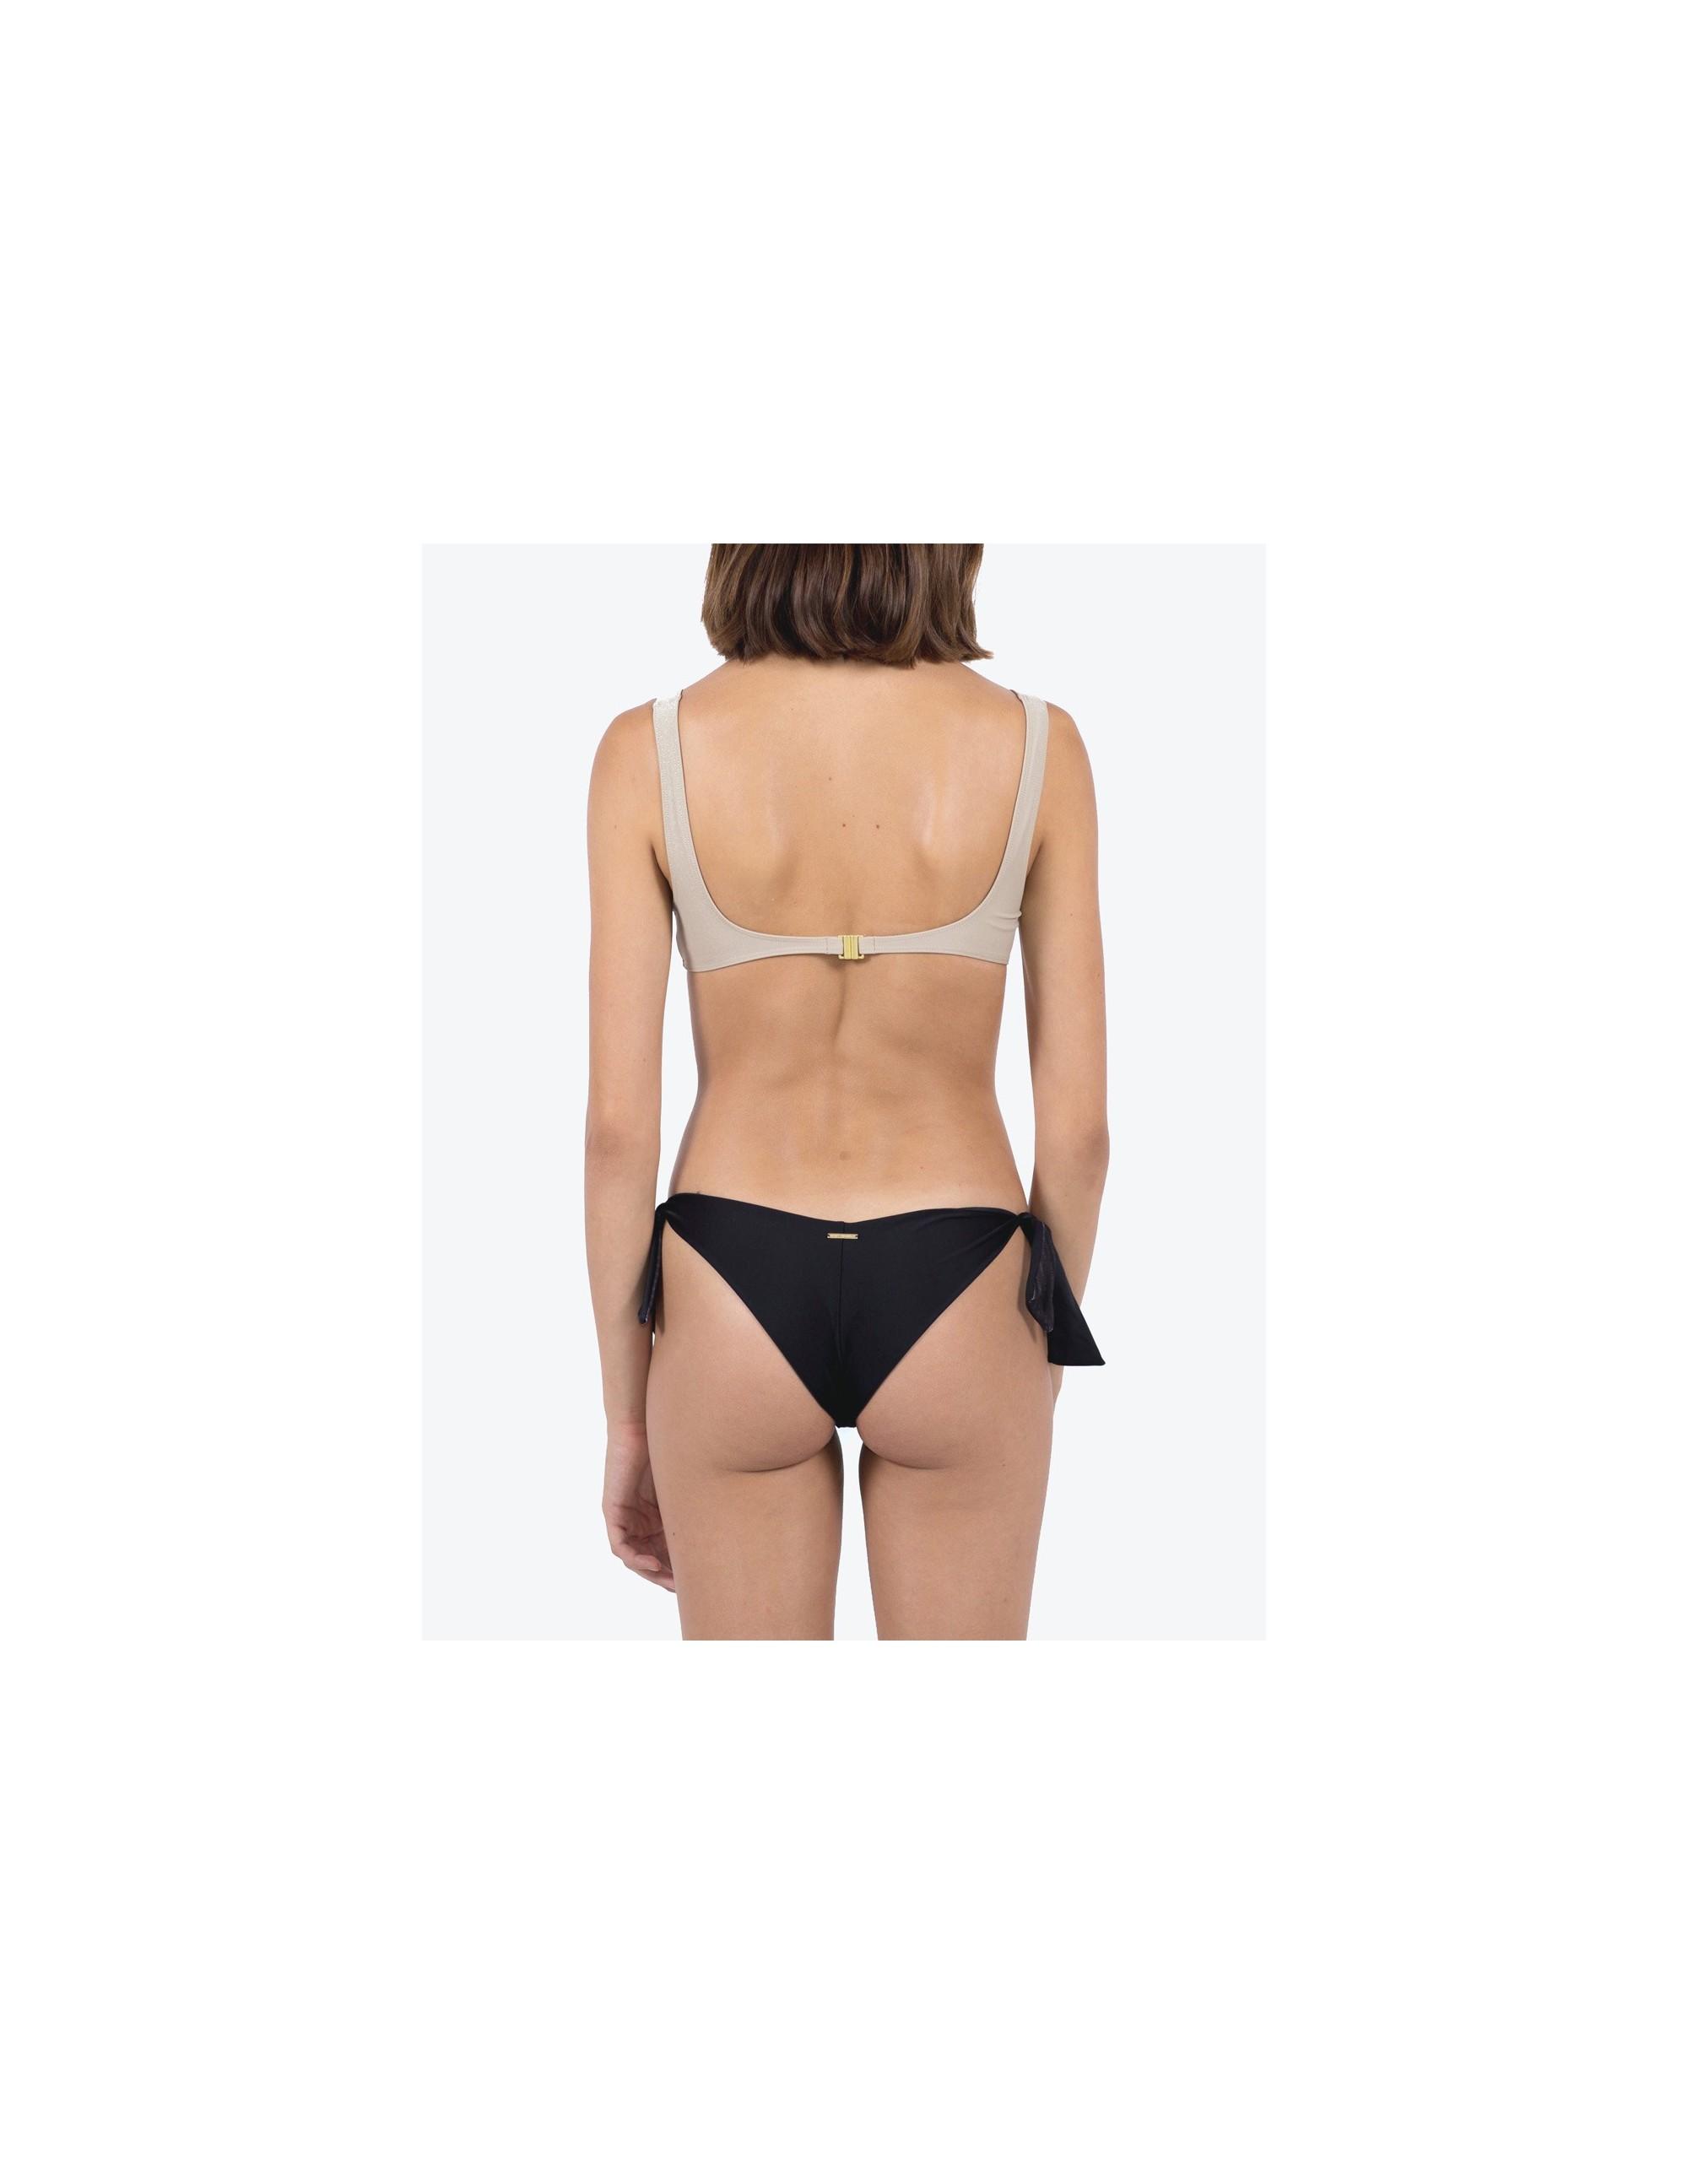 CONTA bikini bottom - MATTE BLACK